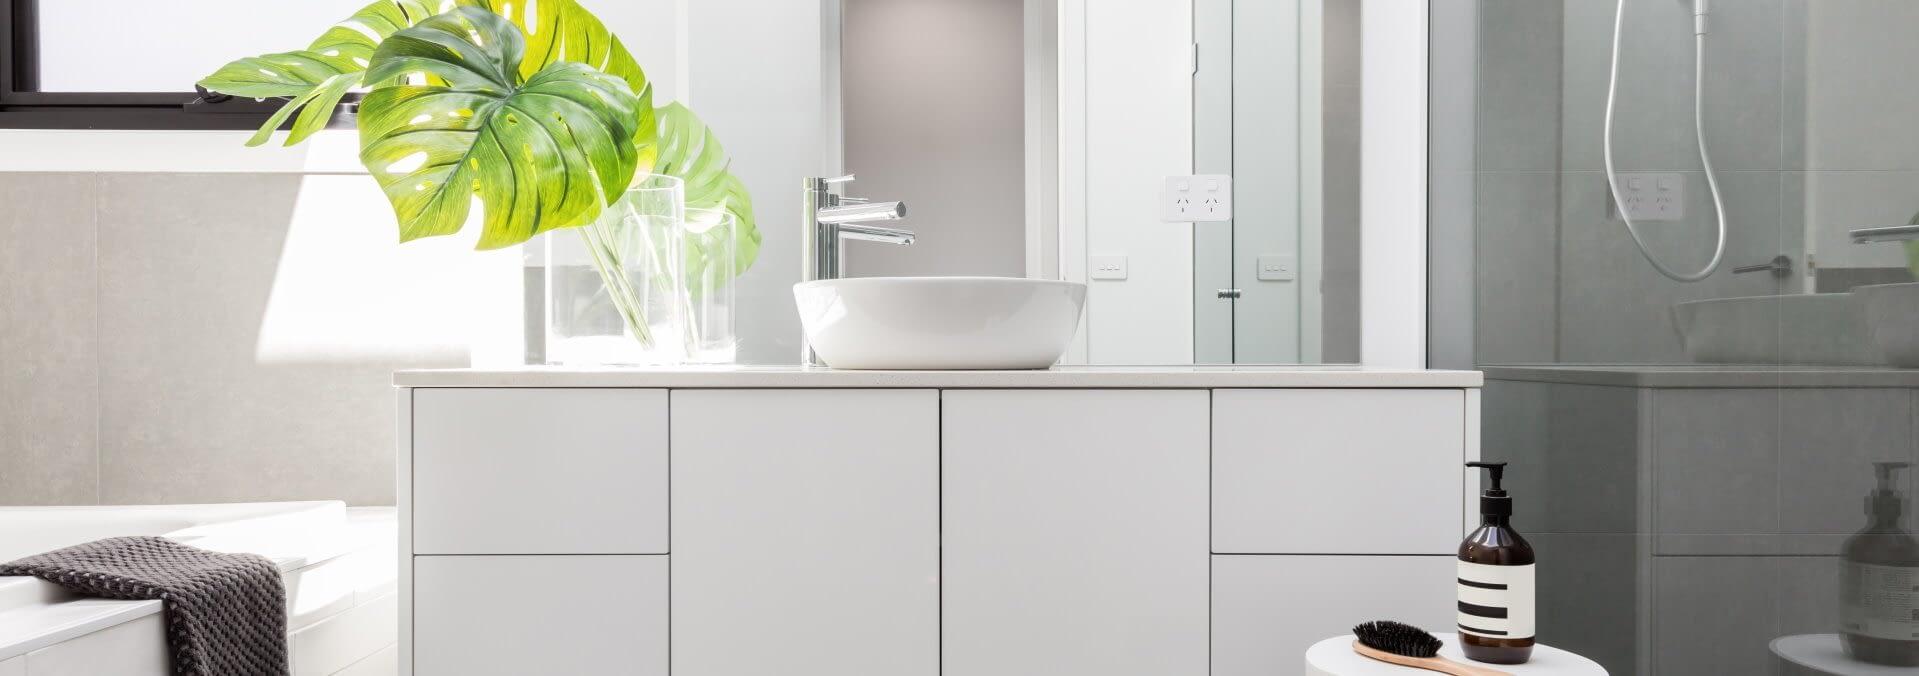 High Quality Affordable Bathroom Renovations